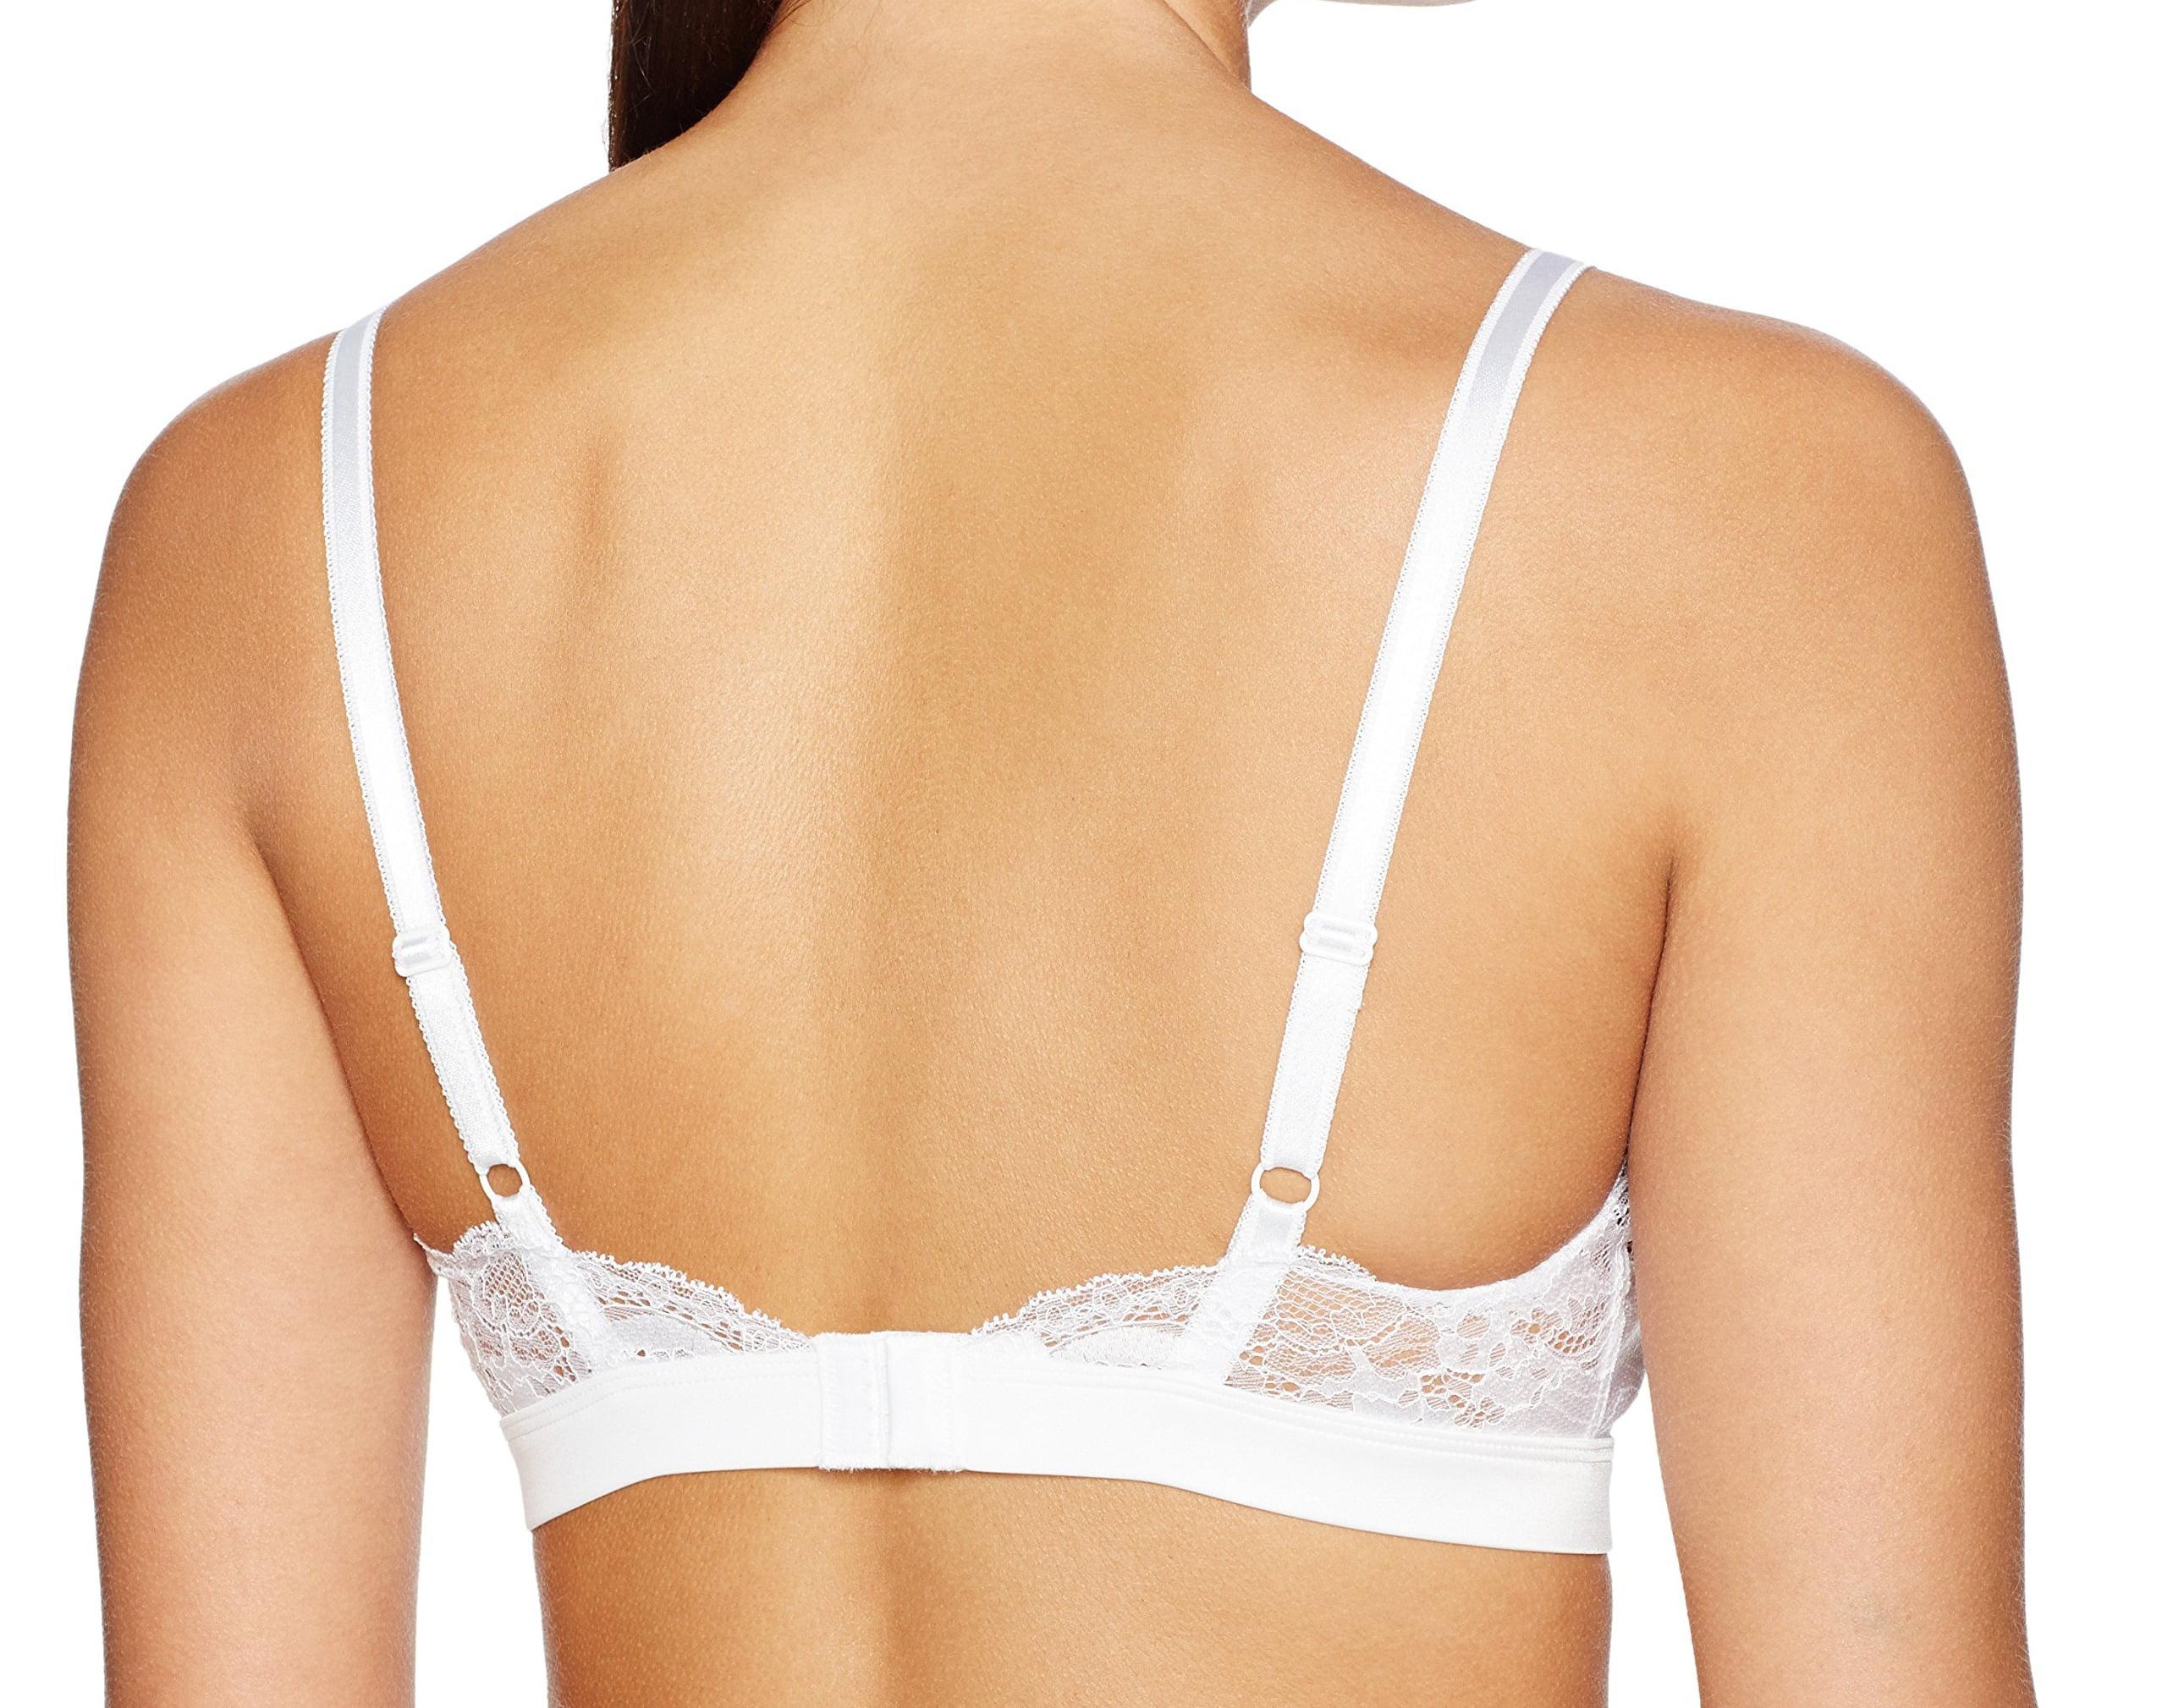 06e13a26ccc Wacoal - Wacoal NEW White Women s Size 38A B Lace Affair Soft Cup Bralette  Bra - Walmart.com